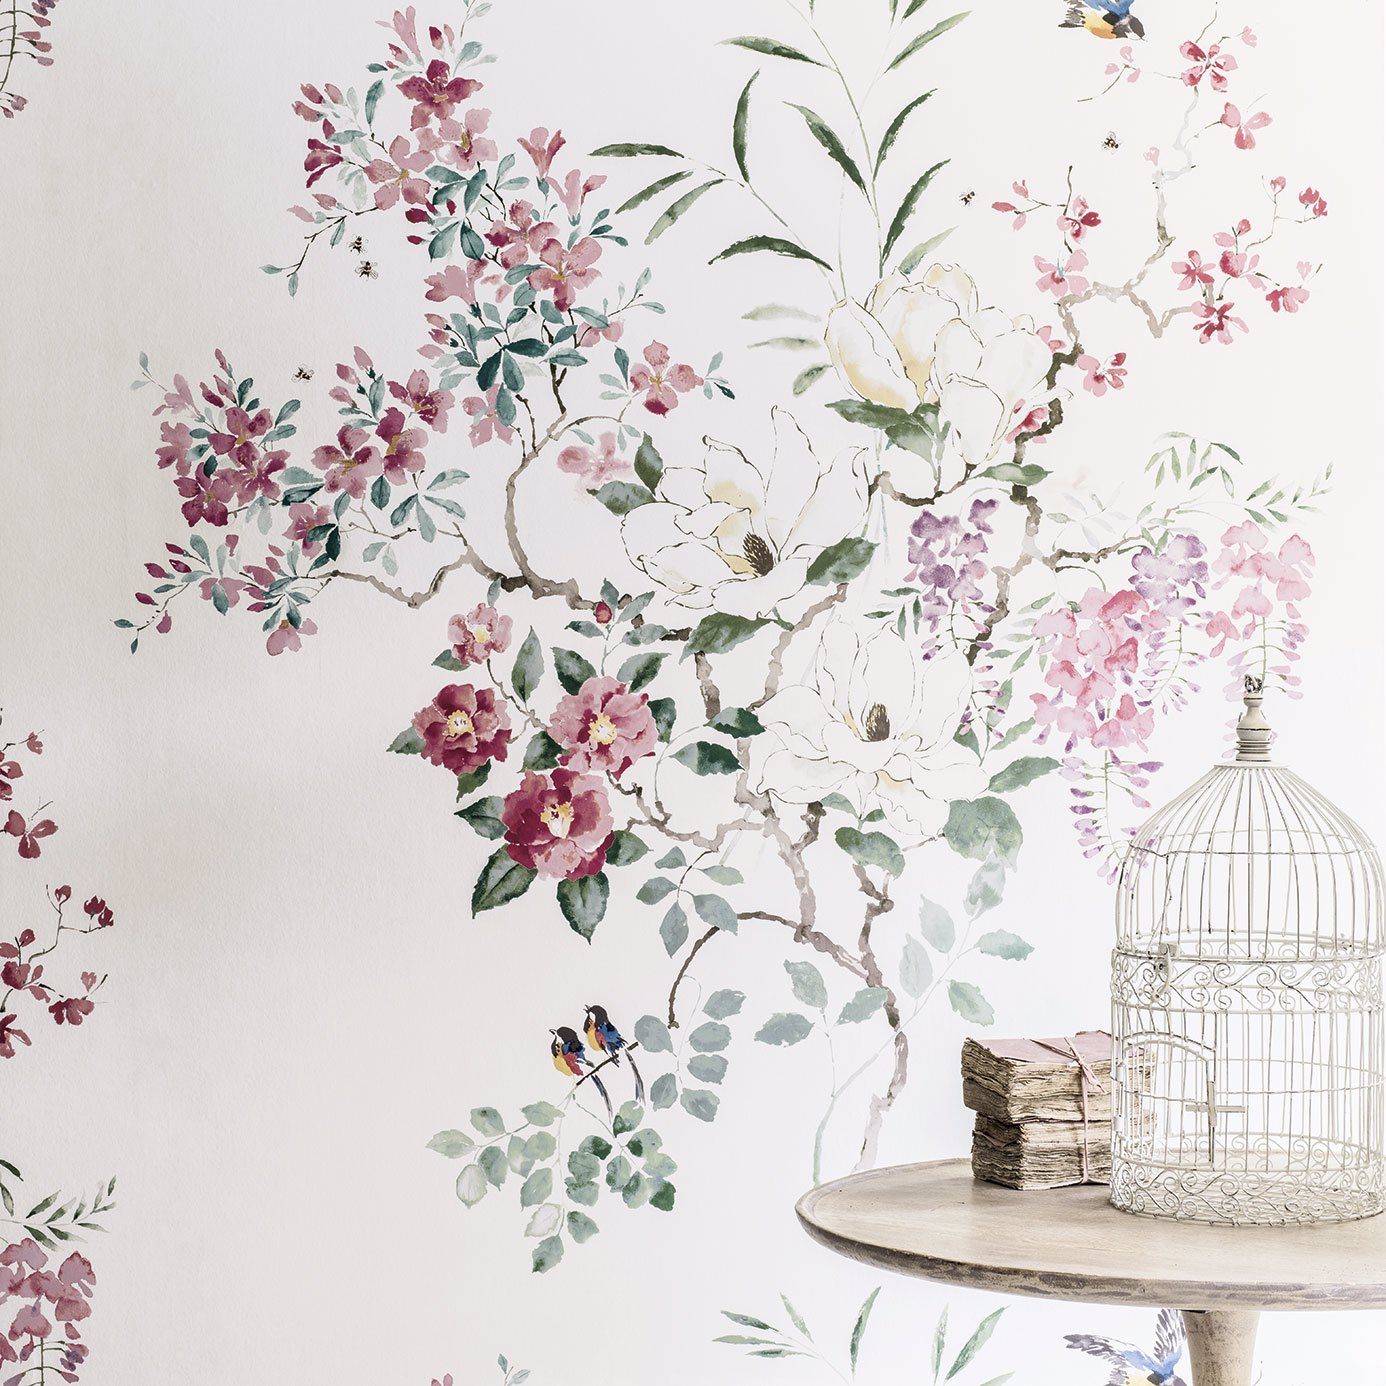 Magnolia & Blossom Panel B by SAN